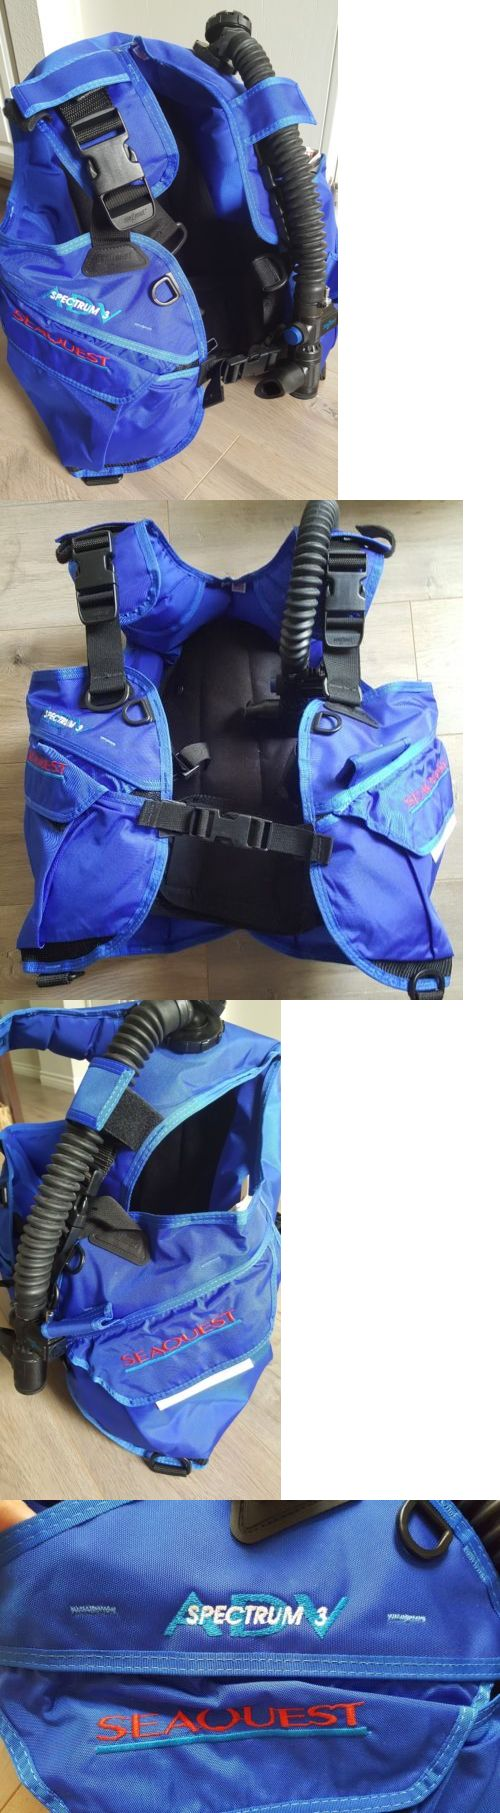 Buoyancy Compensators 16053: Scuba Bcd Seaquest Sprectrum 3 Adv Size M Nwot! -> BUY IT NOW ONLY: $65 on eBay!